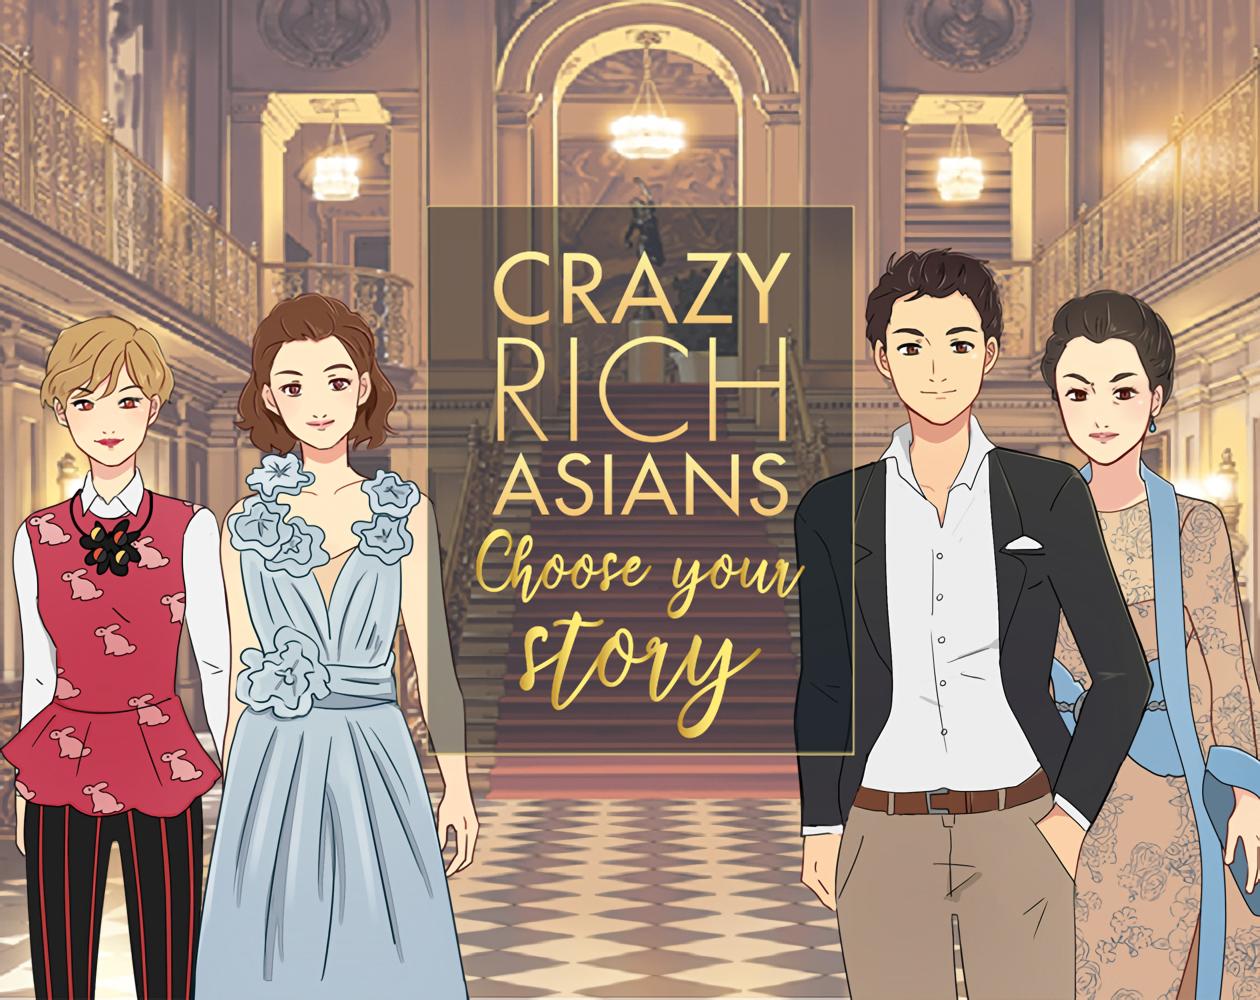 Crazy Rich Asians: Choose Your Story